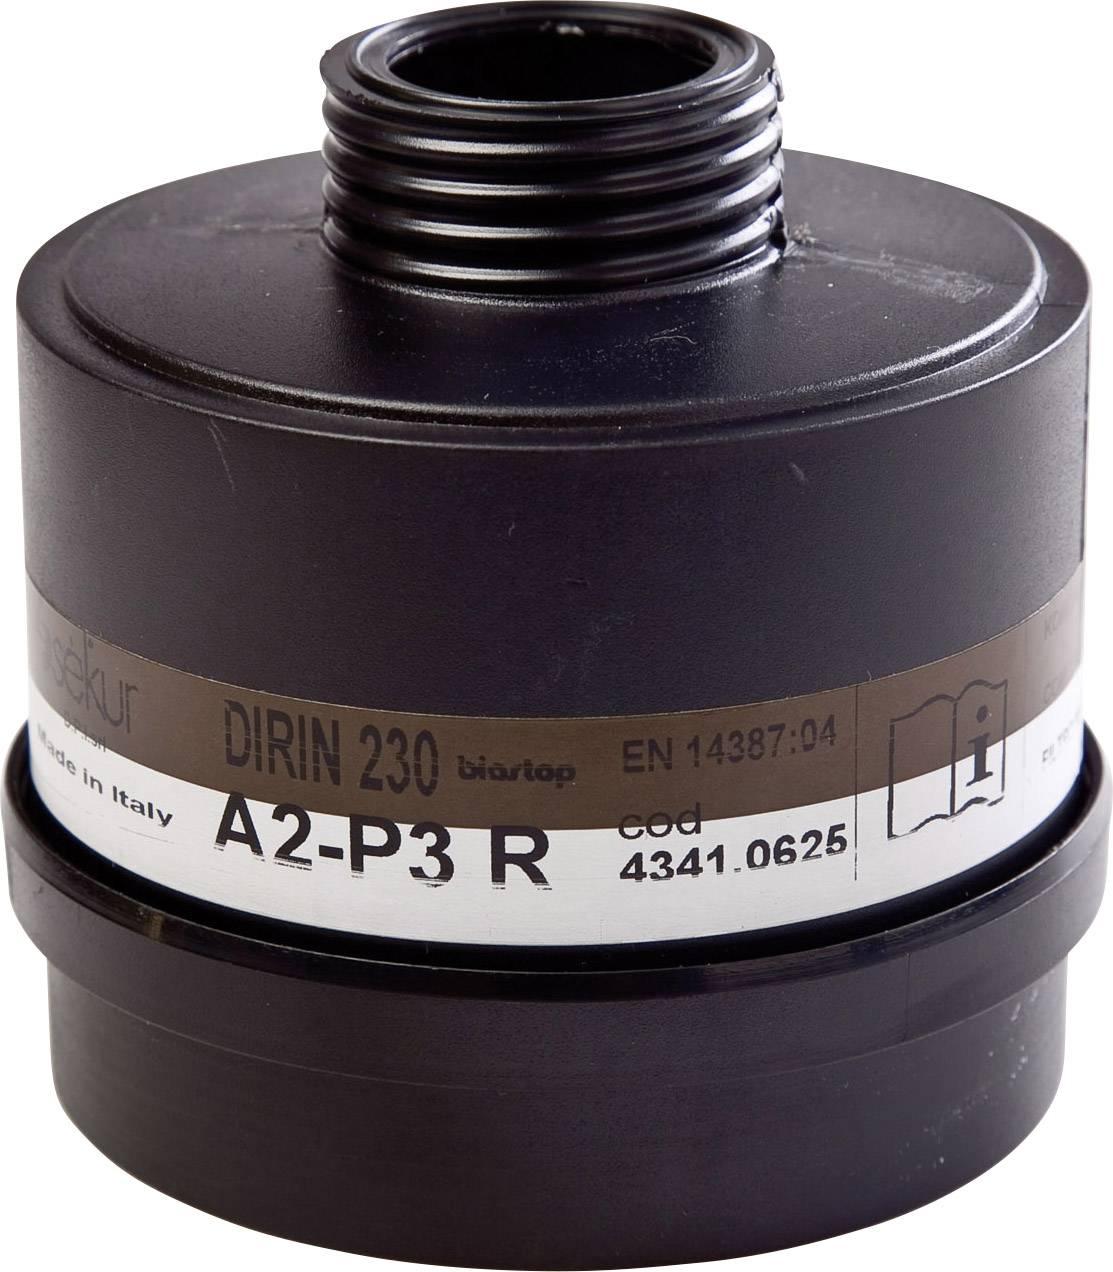 Filter pre ochannú plynovú masku EKASTU Sekur DIRIN 230 422 786, 1 ks